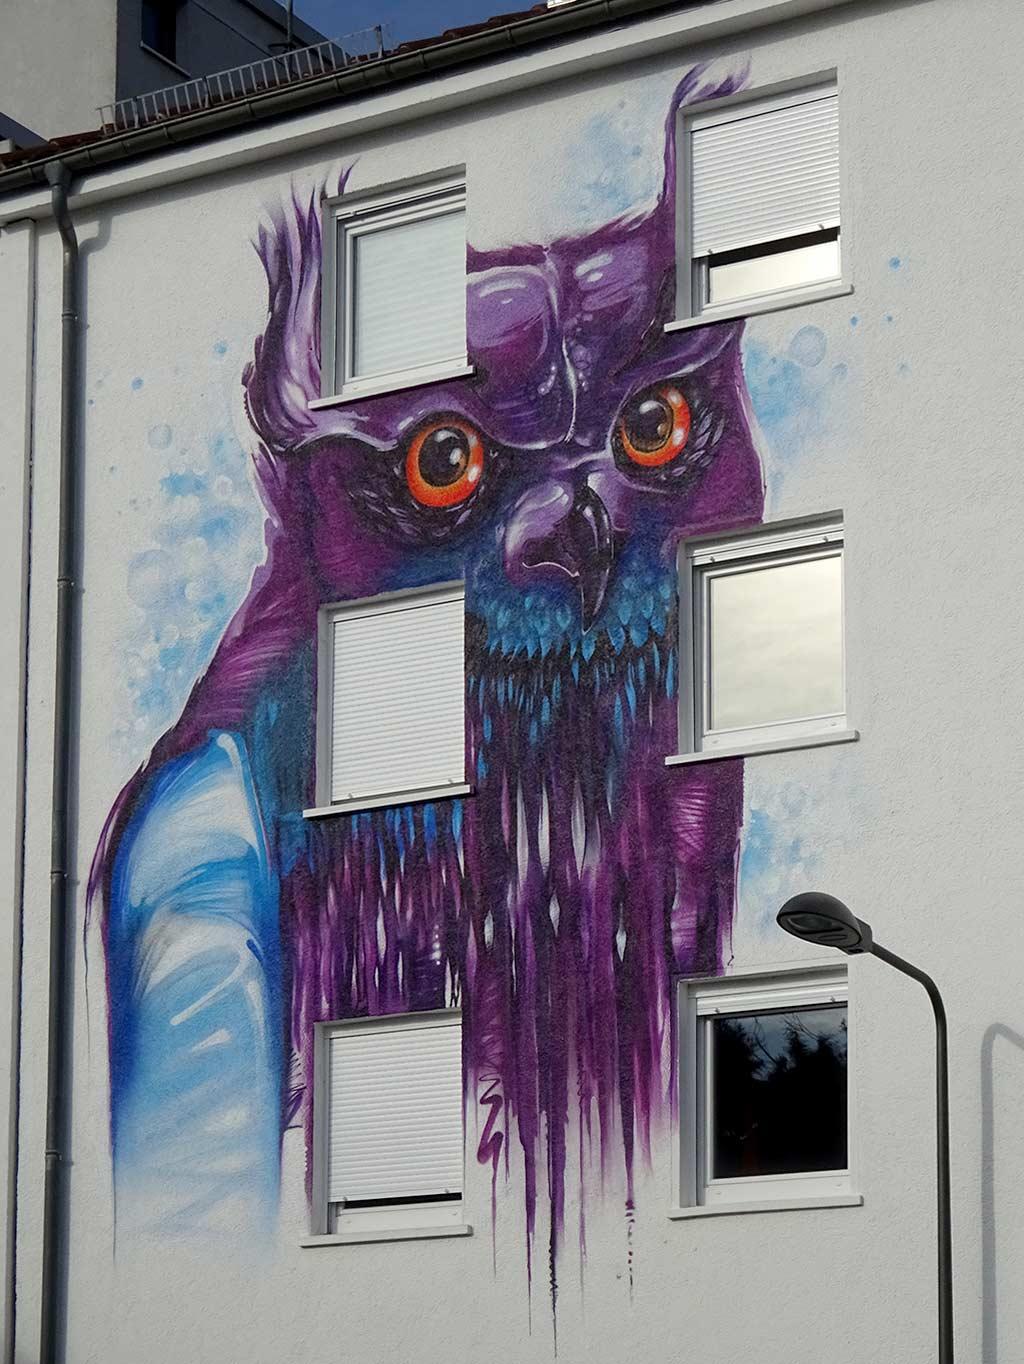 Fassadenkunst mit Eule in Frankfurt